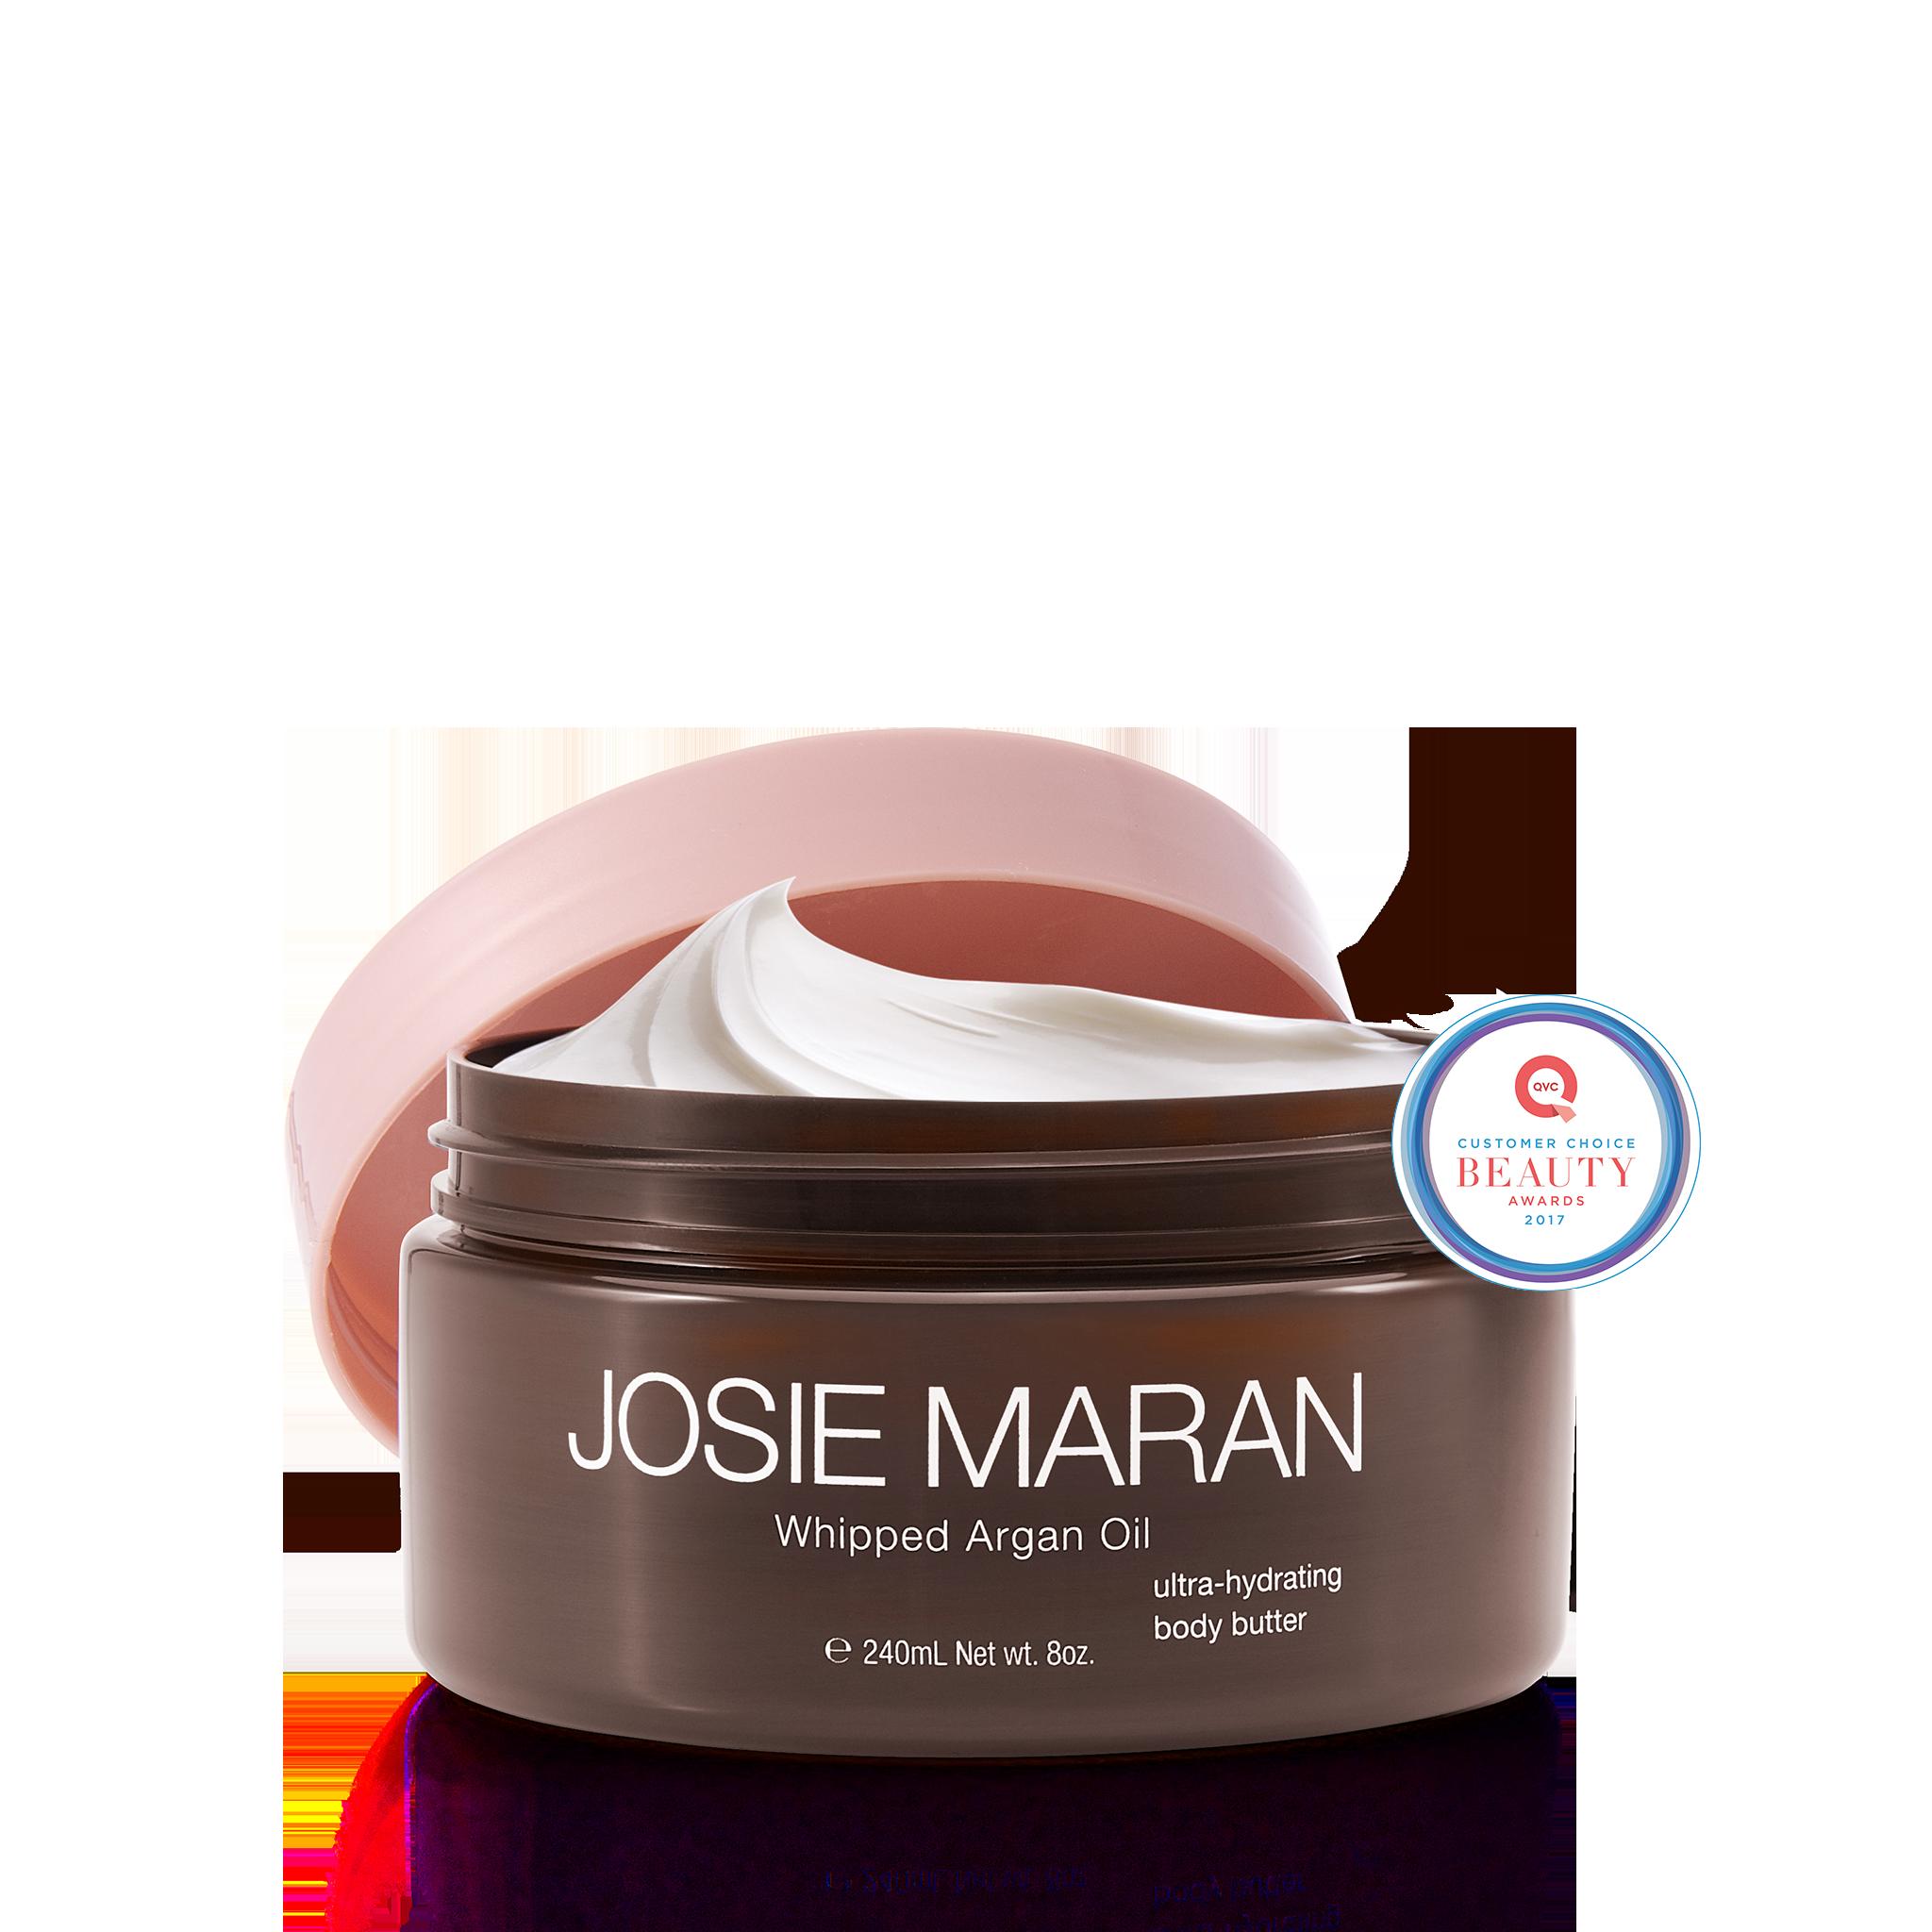 Josie Maran Whipped Argan Oil Body Butter Juicy Mango